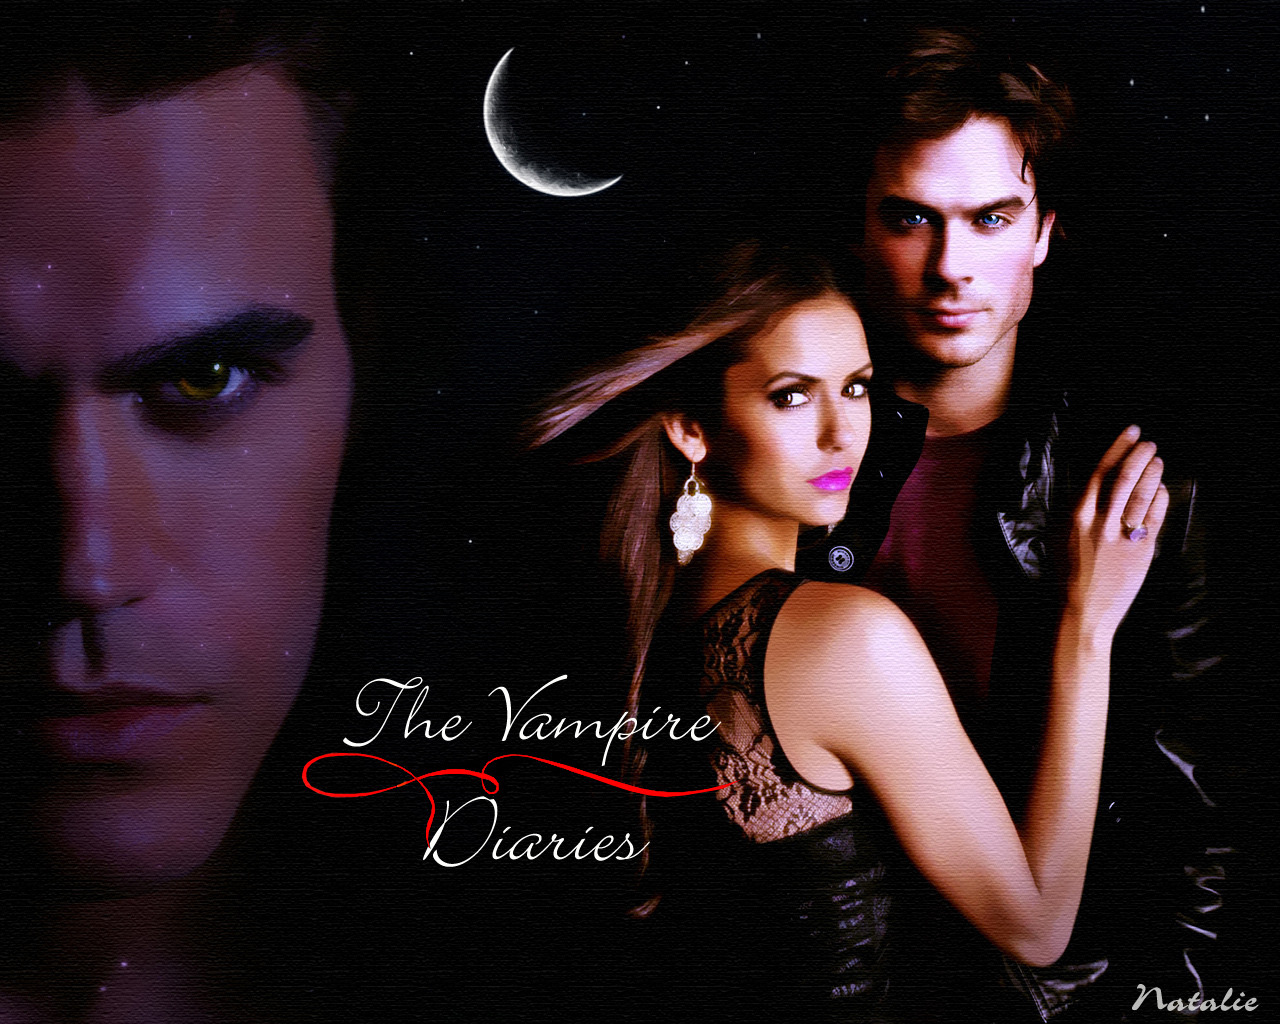 StefanElenaDamon   The Vampire Diaries Wallpaper 16110173 1280x1024